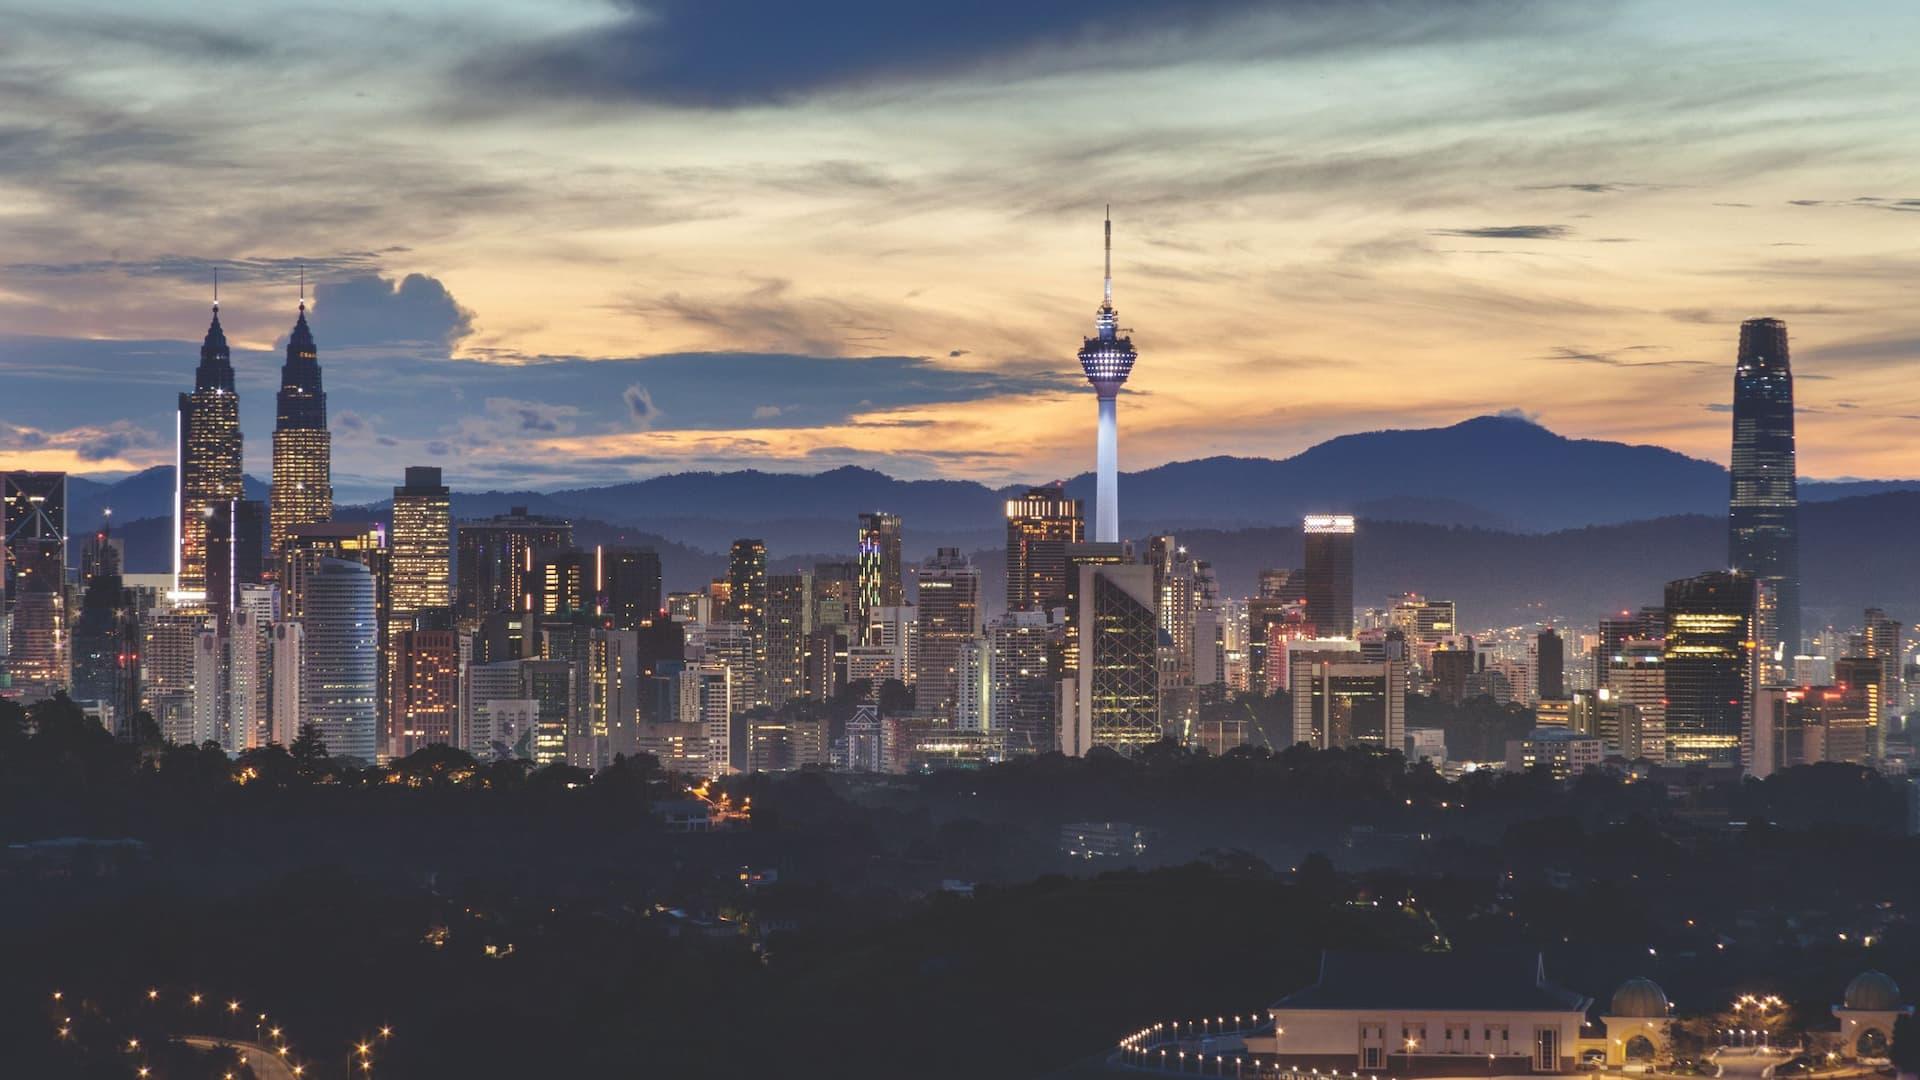 KL Tower Views, Hyatt House Kuala Lumpur, Mont Kiara in Kuala Lumpur